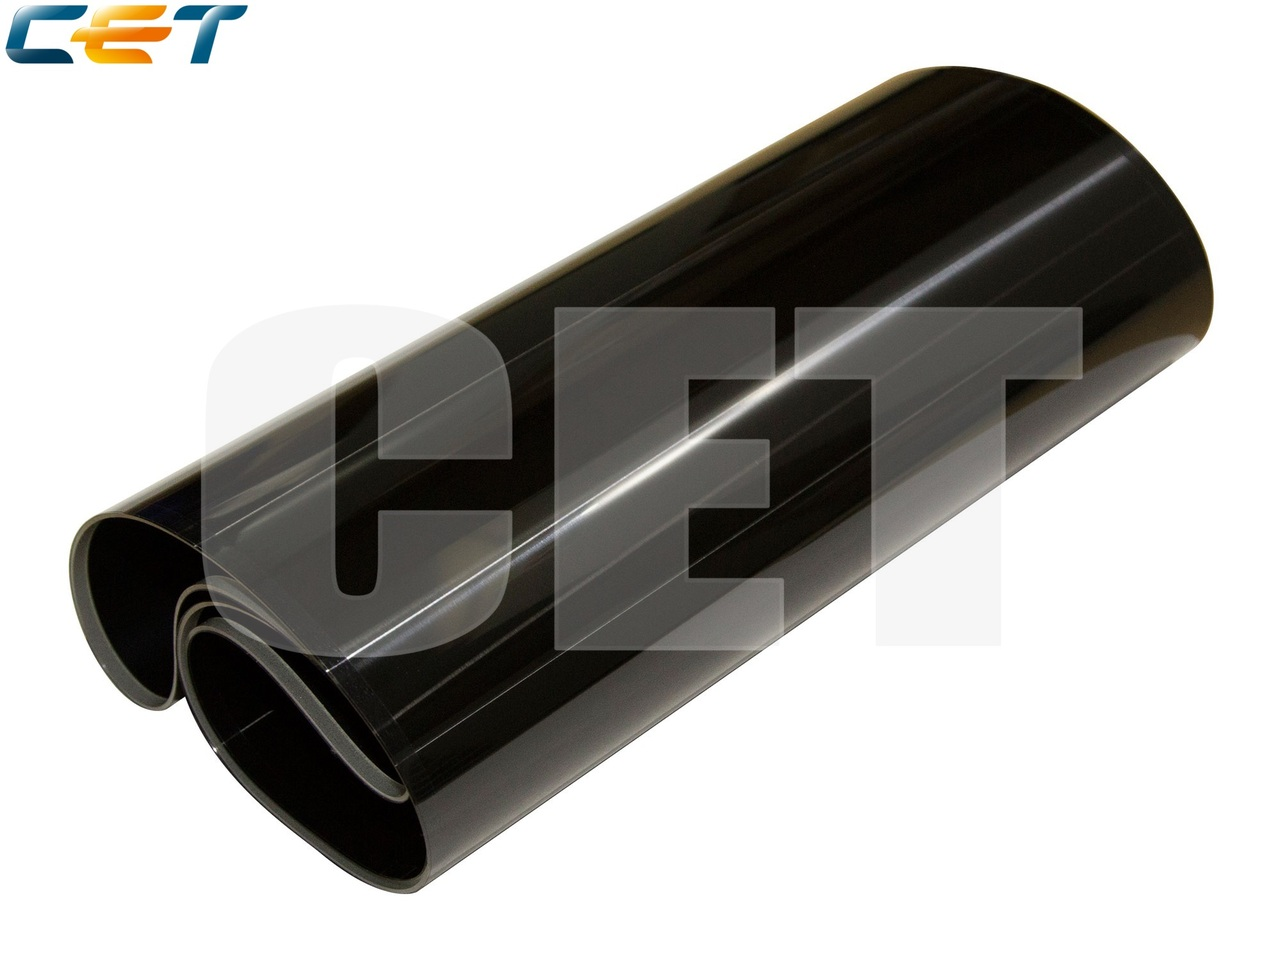 Лента переноса (Япония) D039-6029 для RICOH AficioMPC2030/MPC2050/MPC2051/MPC2530/MPC2550/MPC2551(CET), CET6265